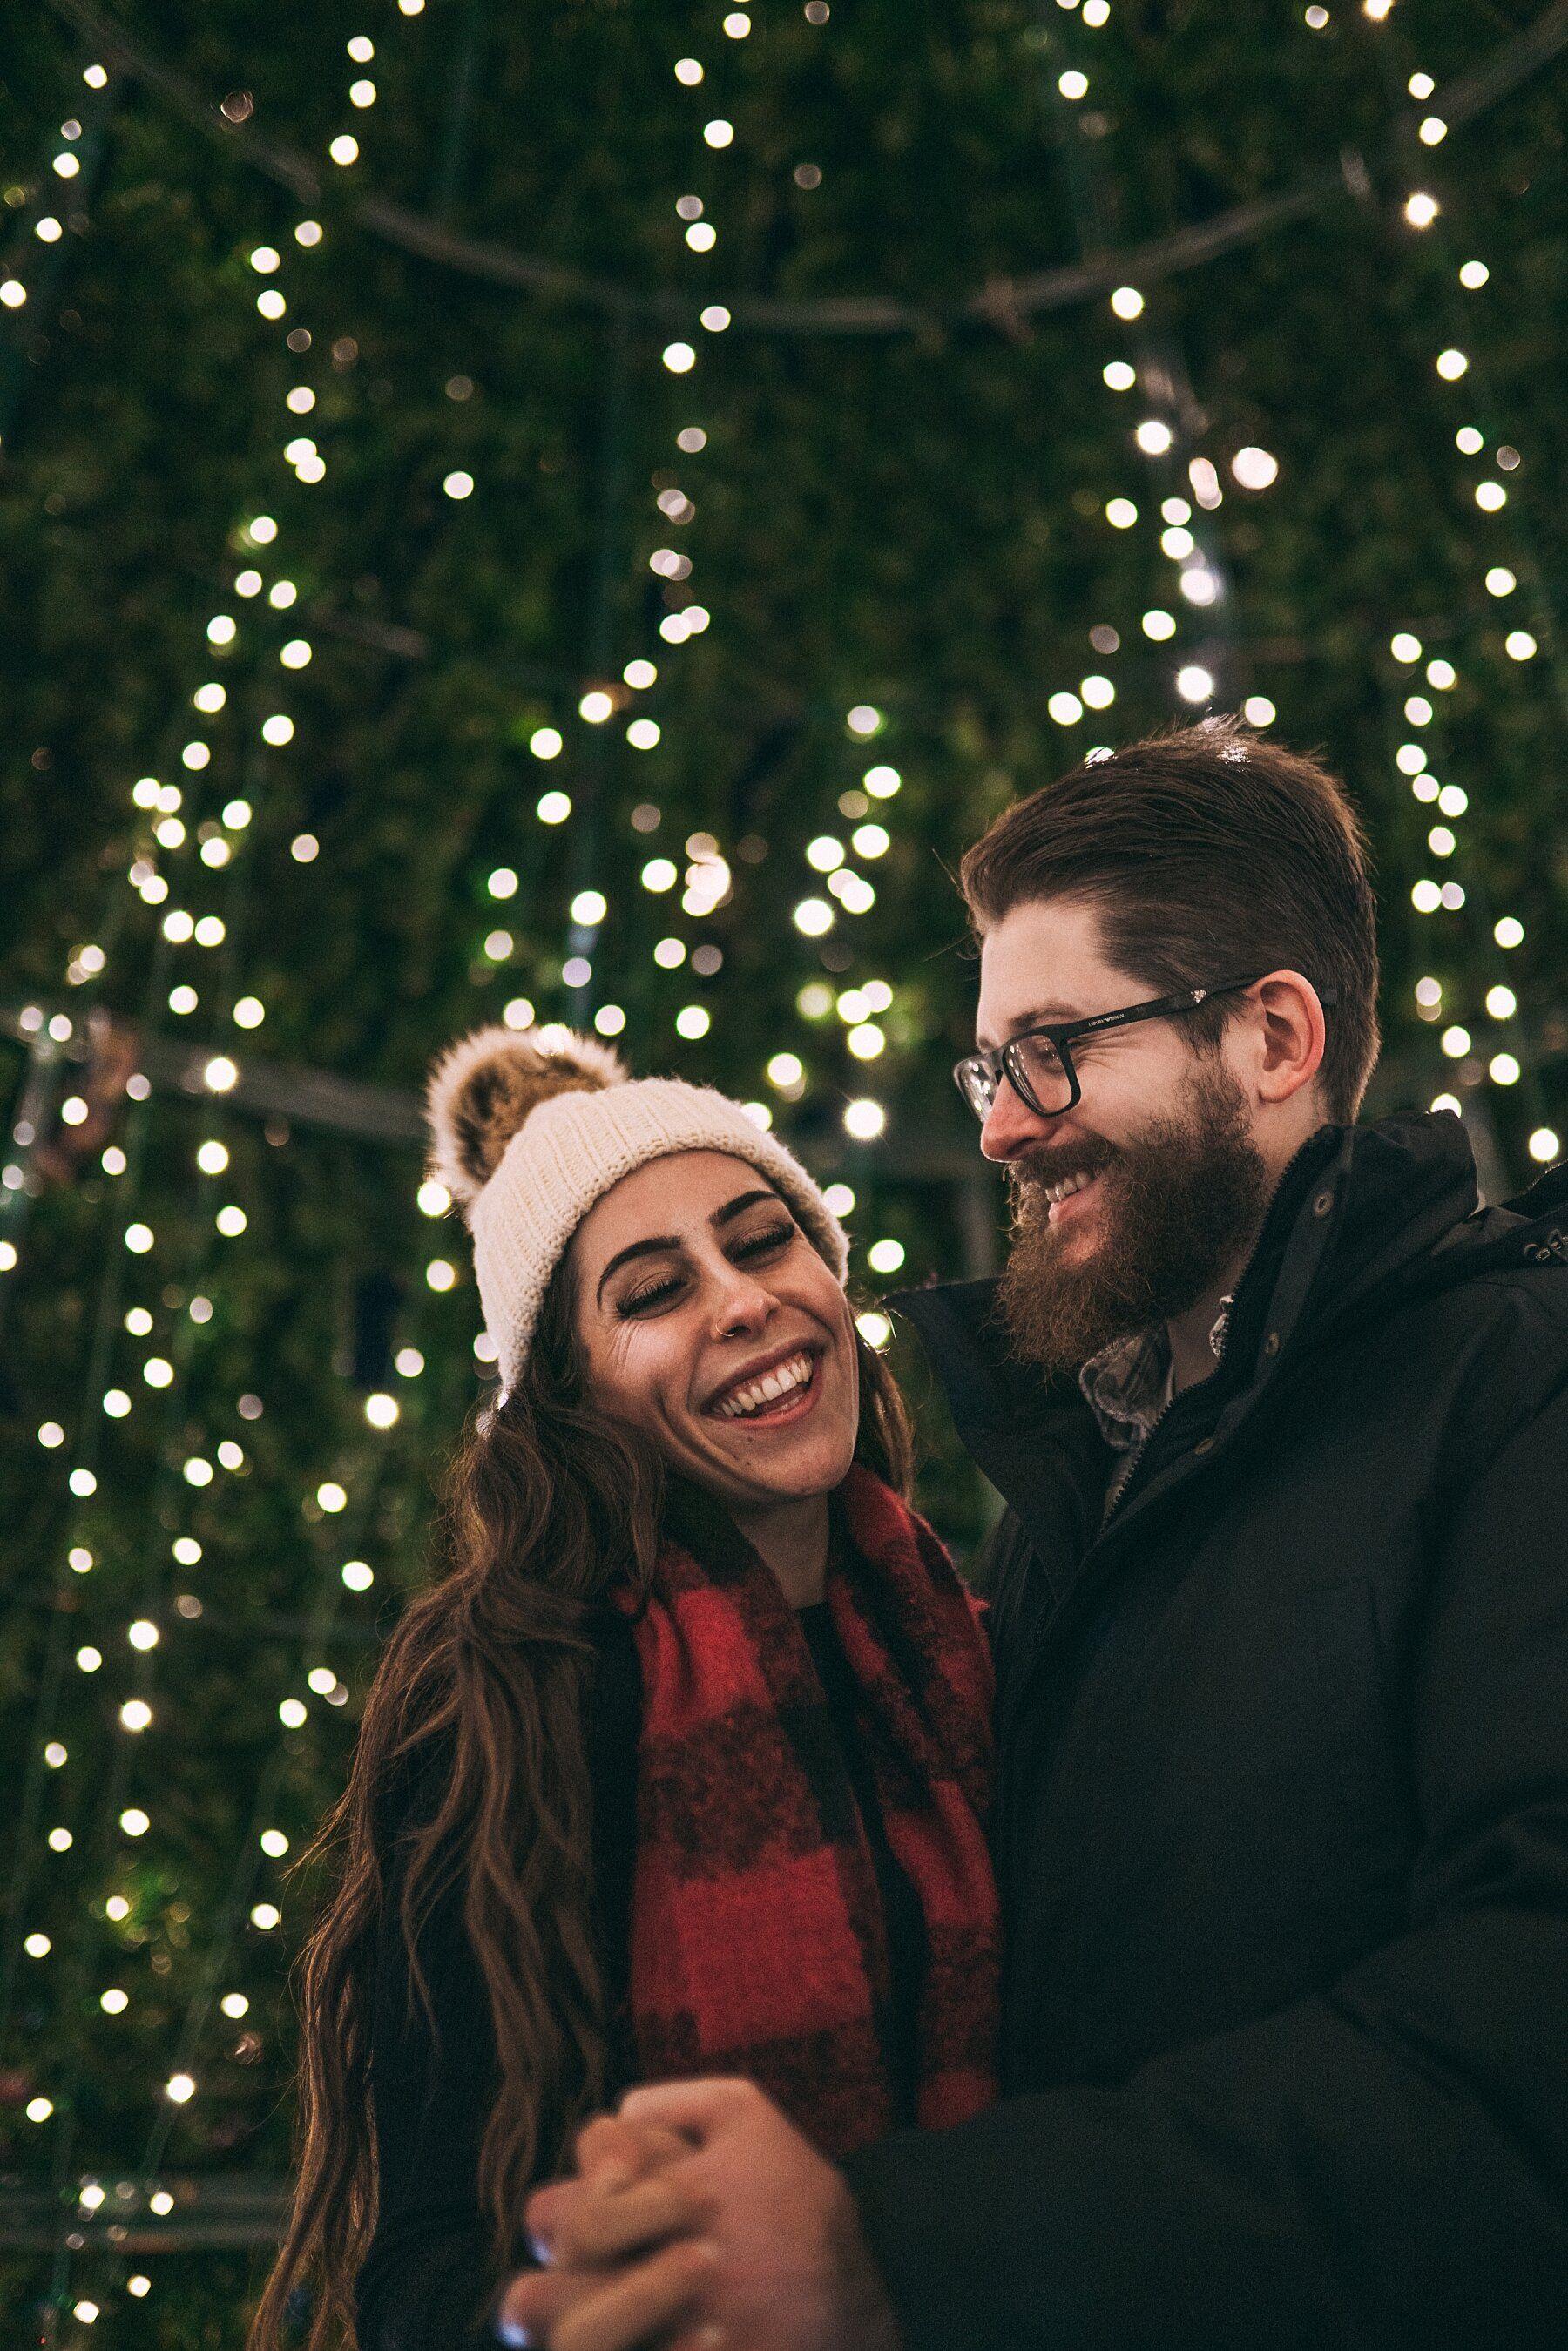 Christmas Market Winter Date Night In Canada In 2020 Vancouver Christmas Market Christmas Market Date Night